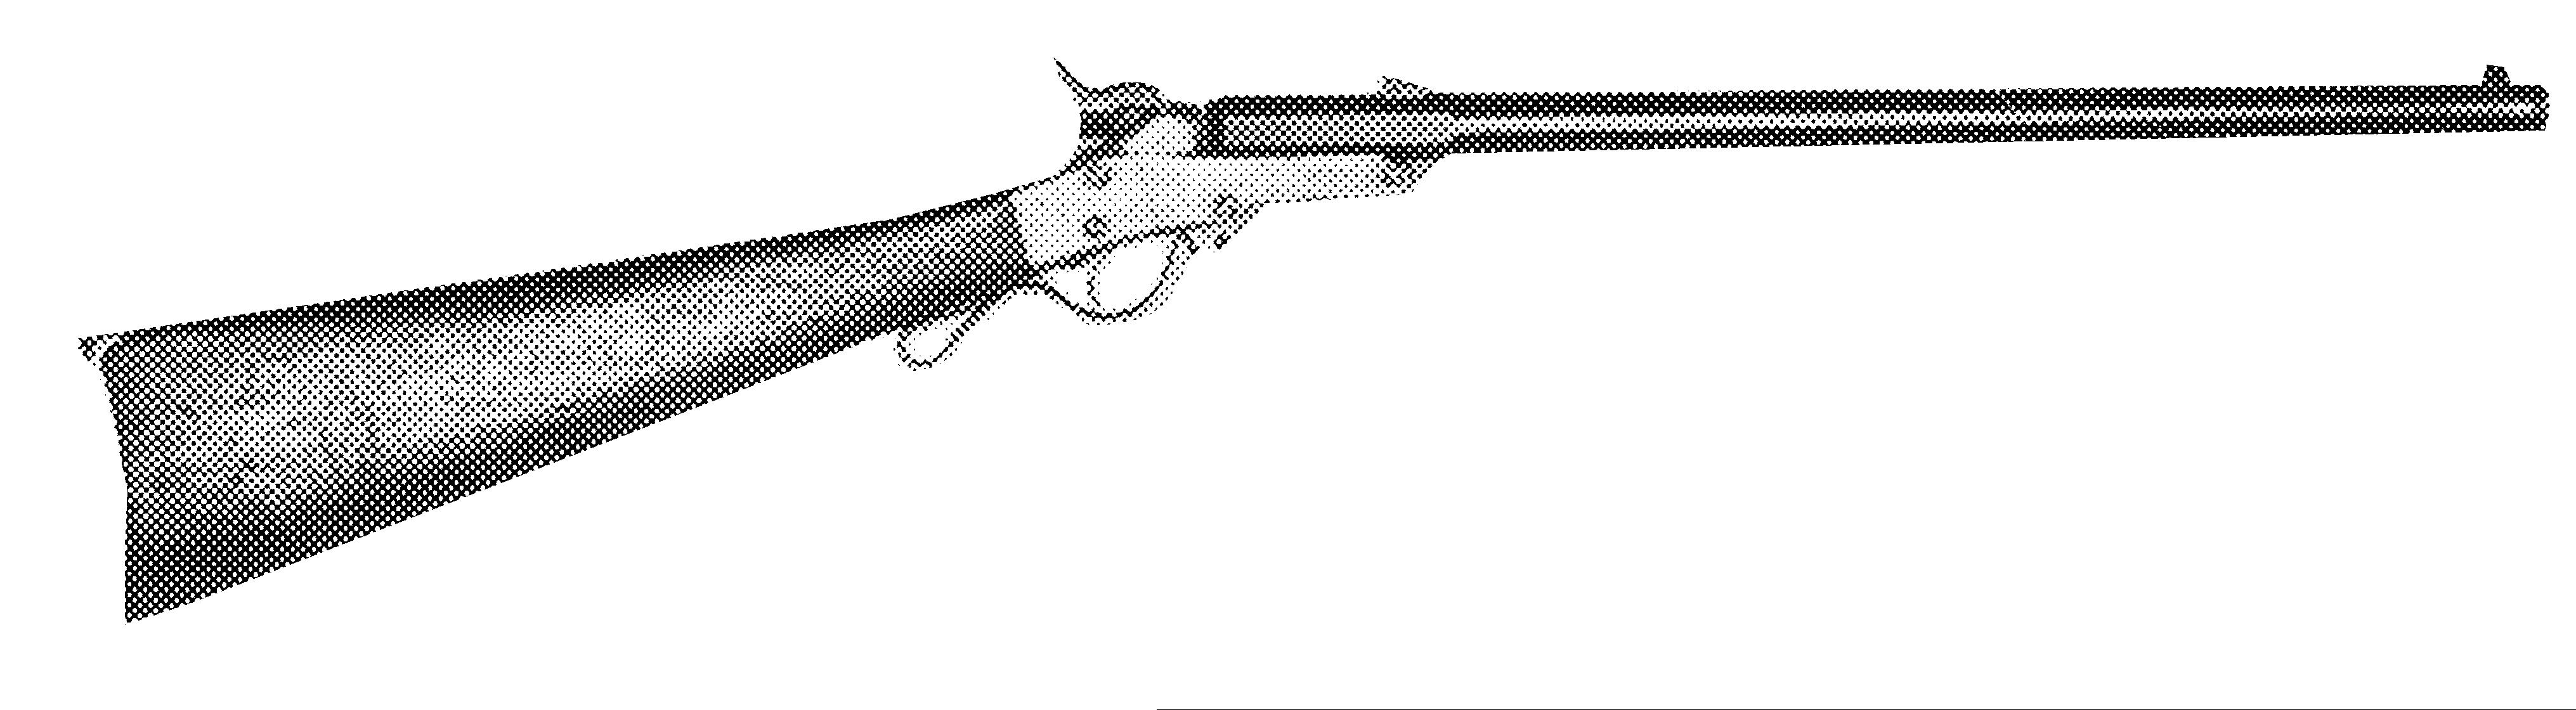 2nd Model